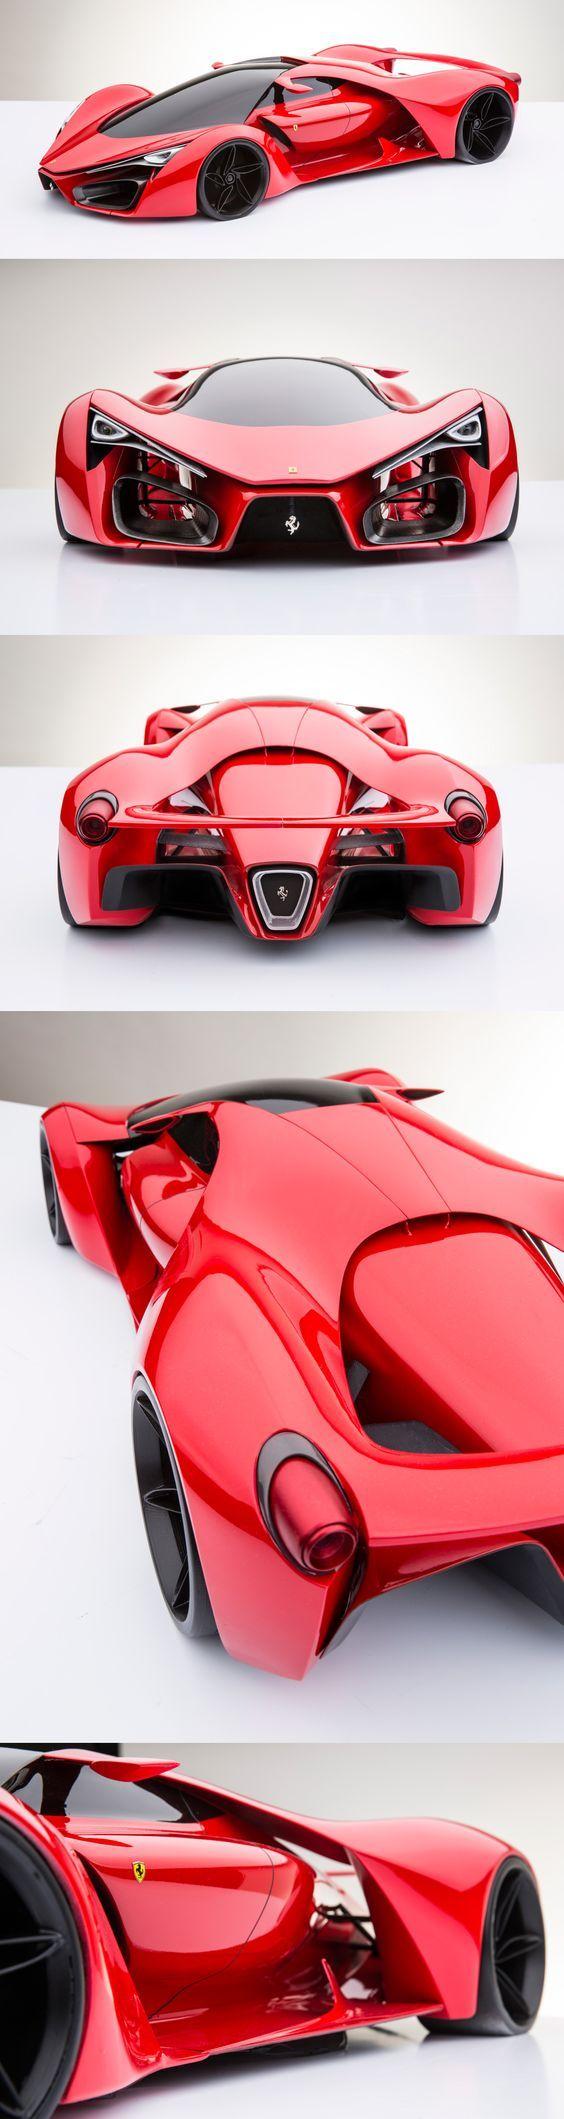 Ferrari F80 Ferrari Concept: